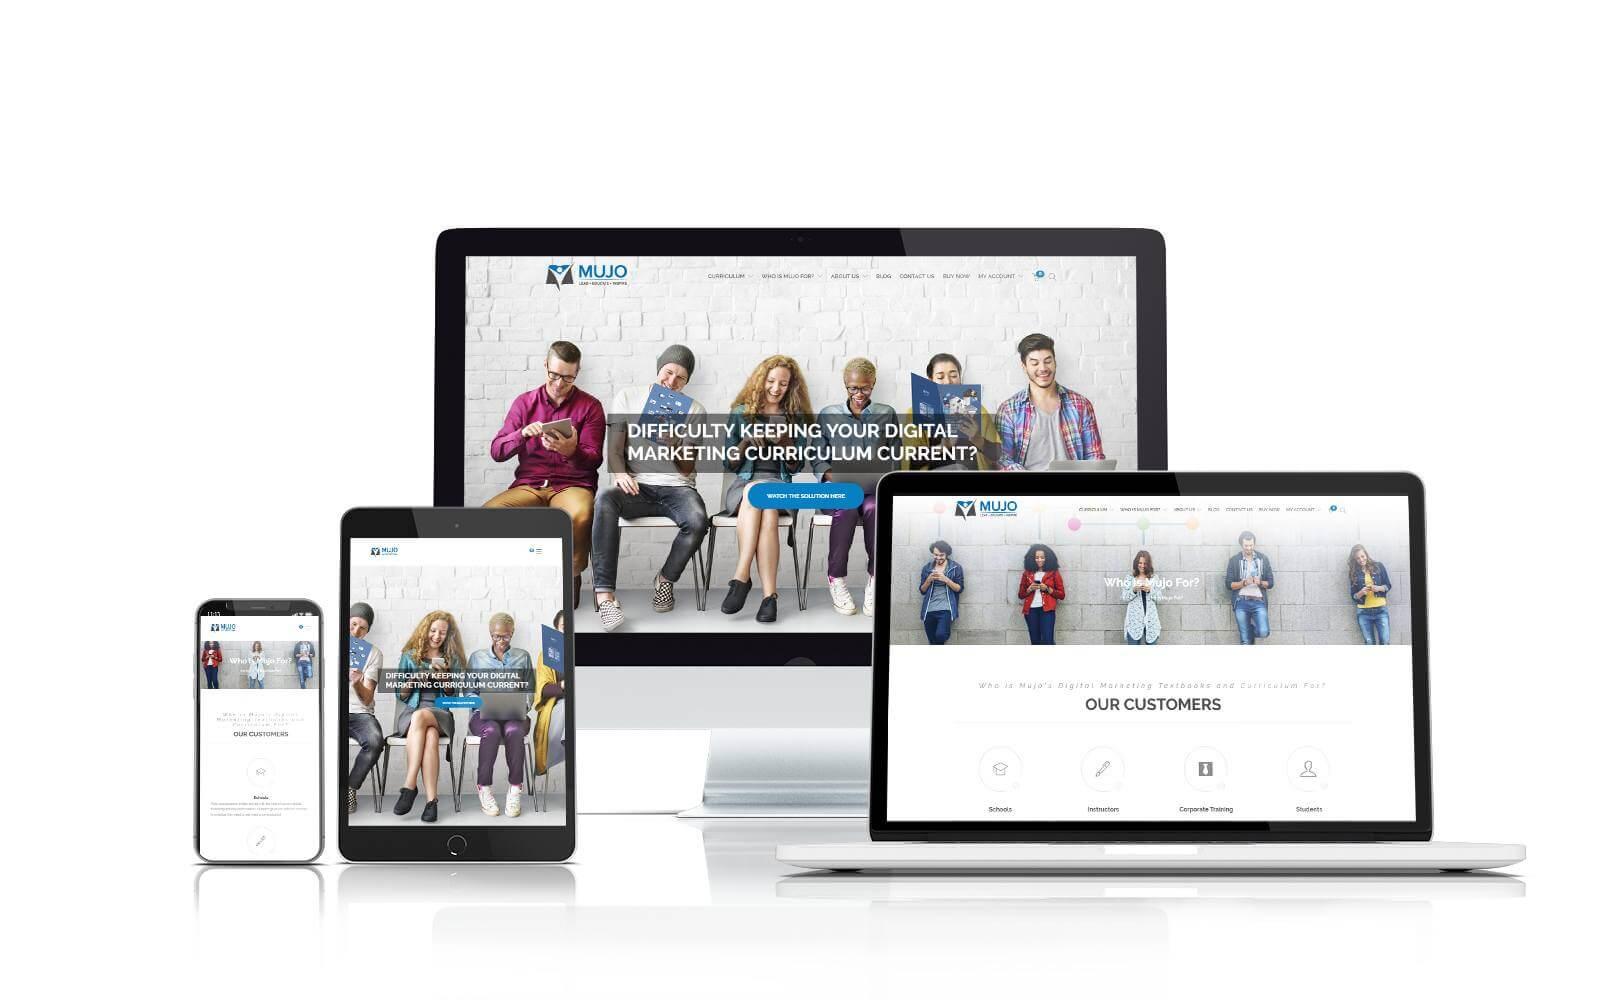 Mujo website